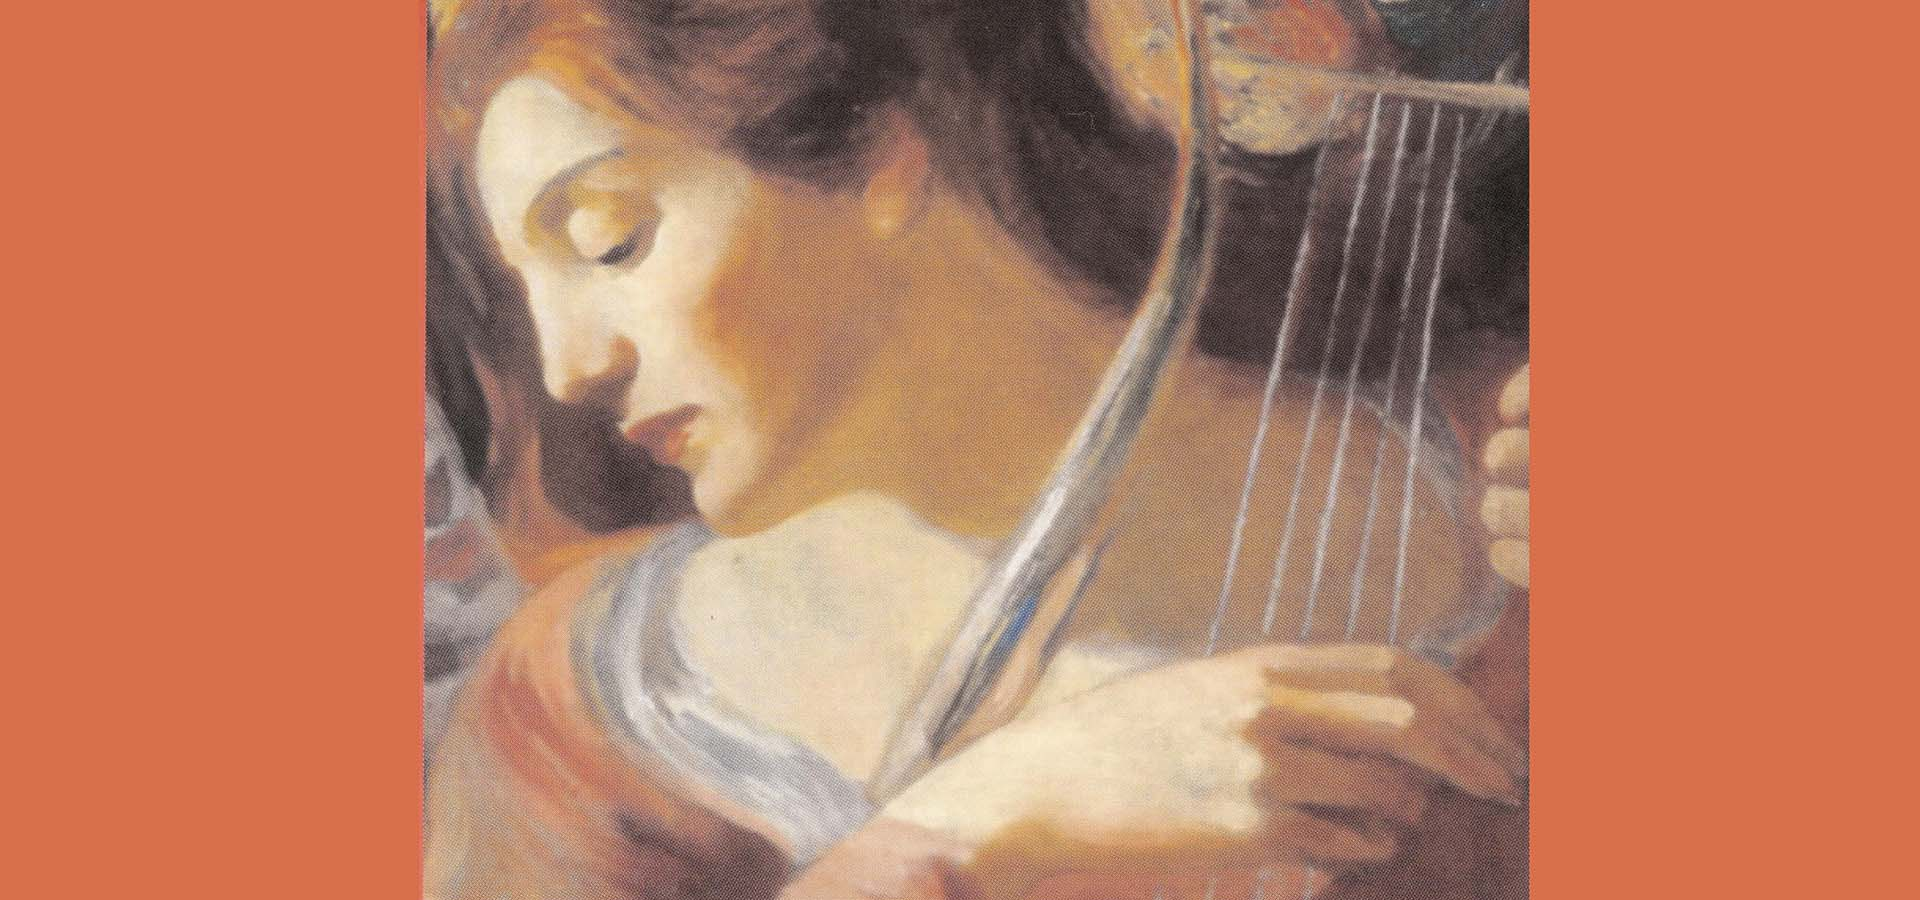 Kahlil Gibran - Η Μουσική